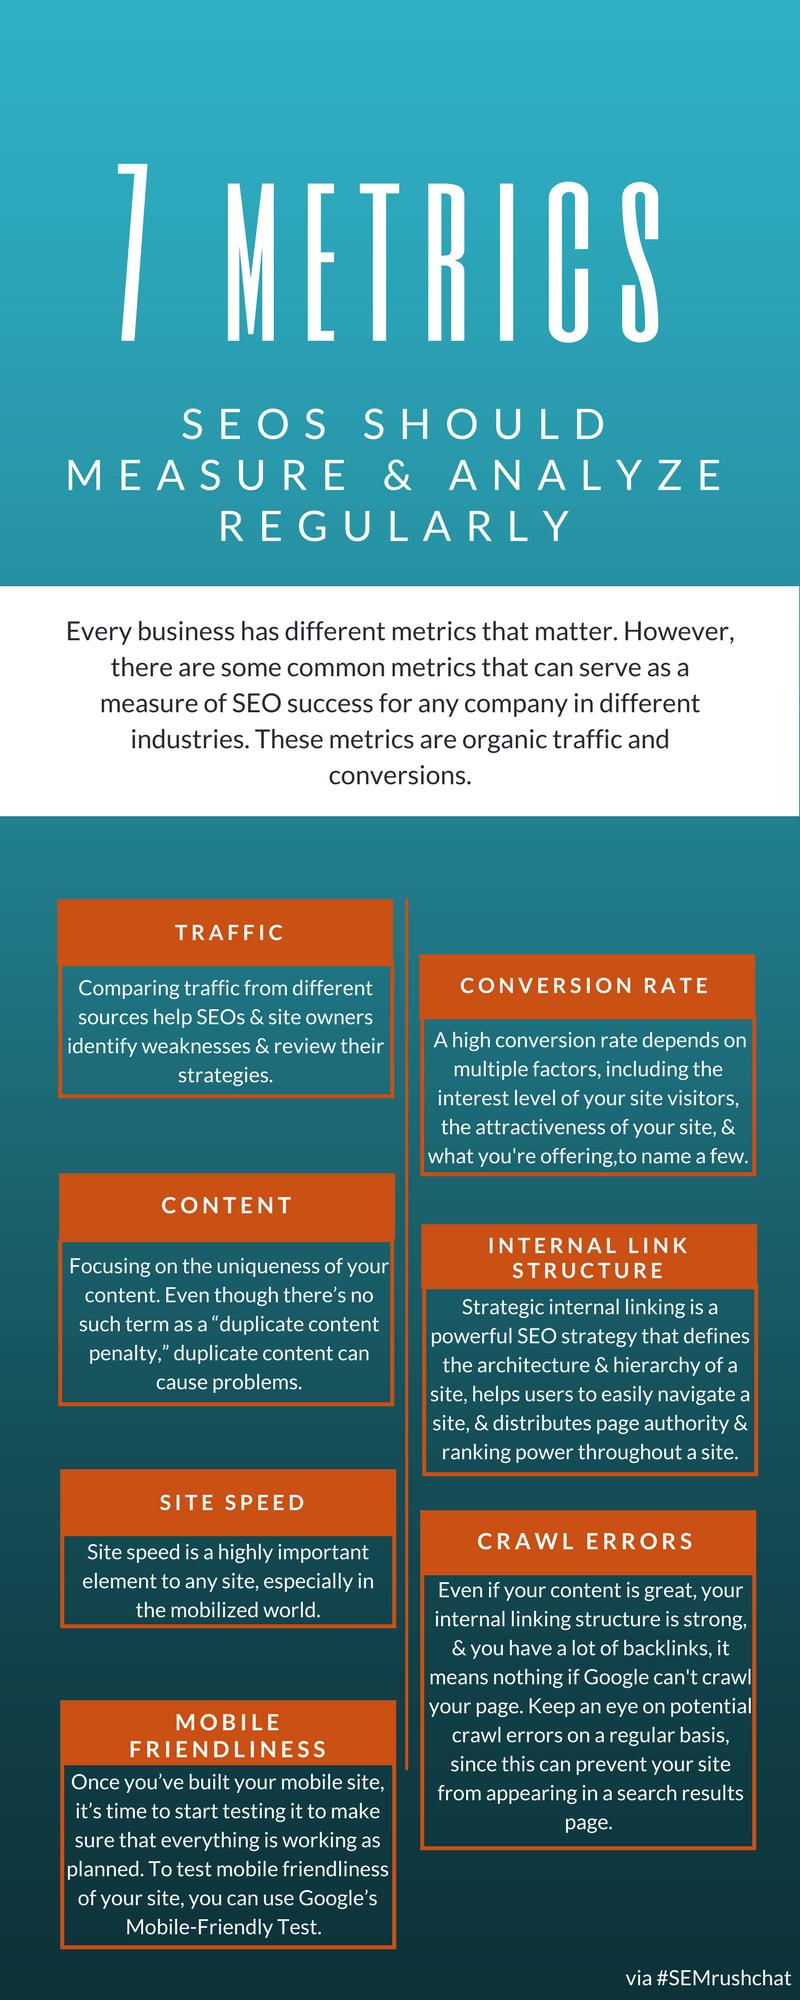 7-metrics-seos-should-measure-and-analyze-regularly.png